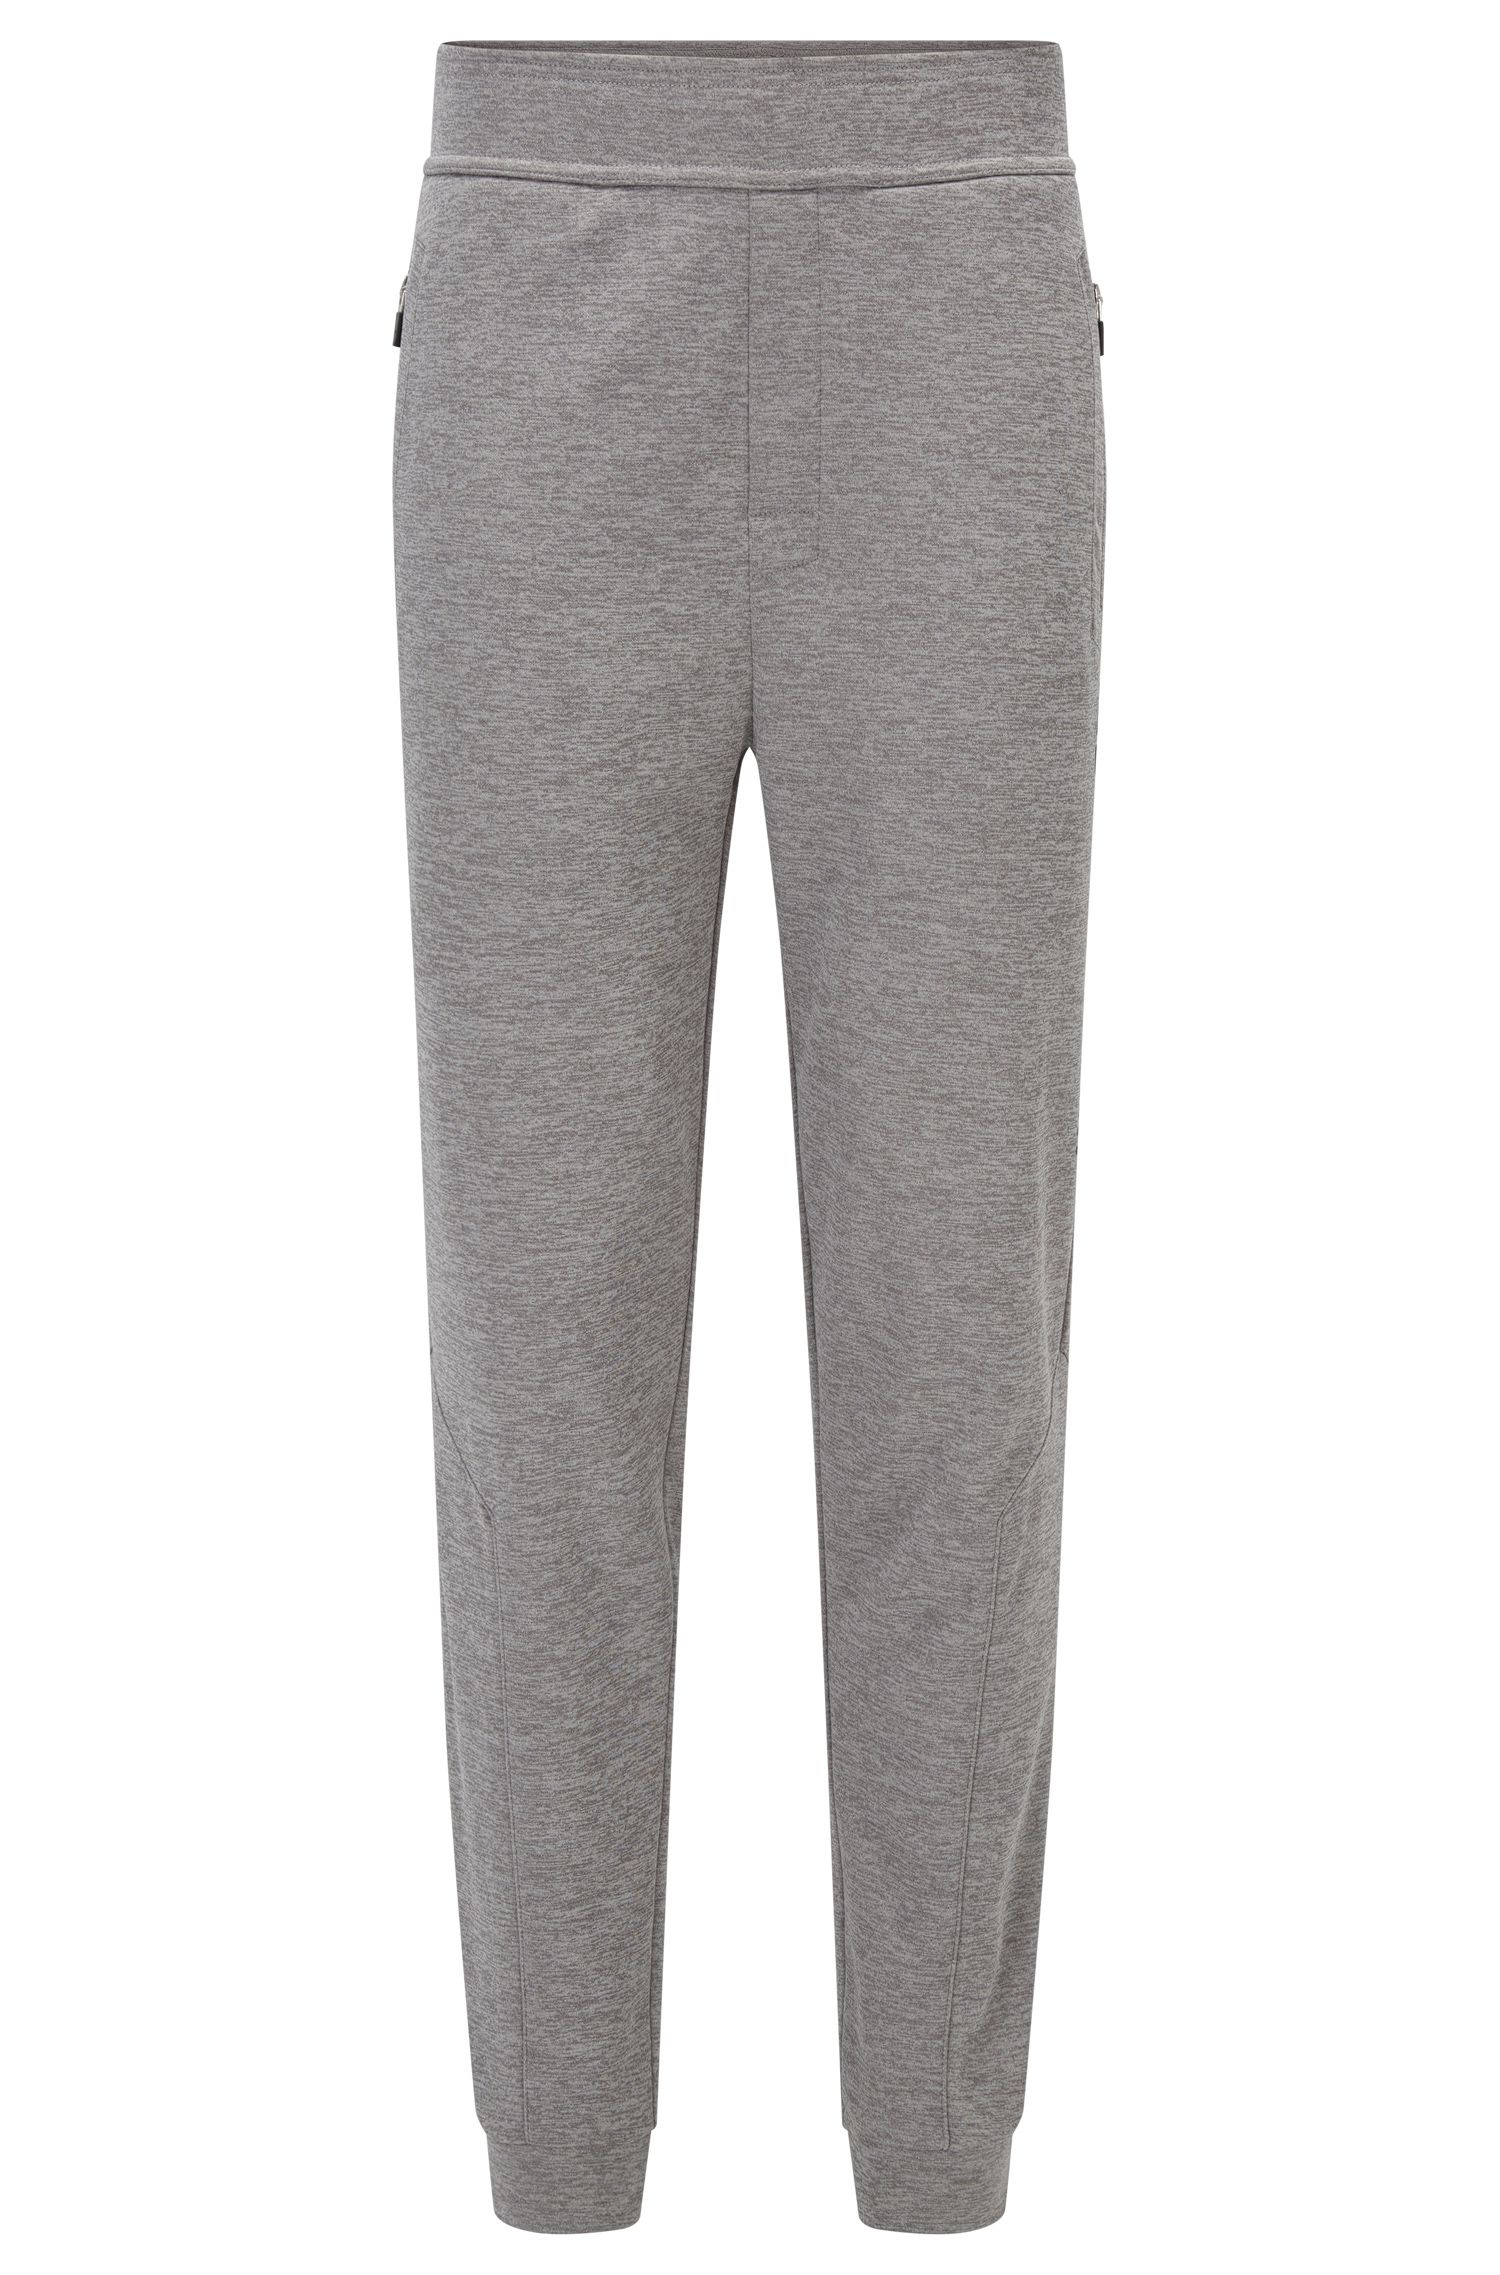 Pantalones loungewear con forro de vellón en tejido técnico